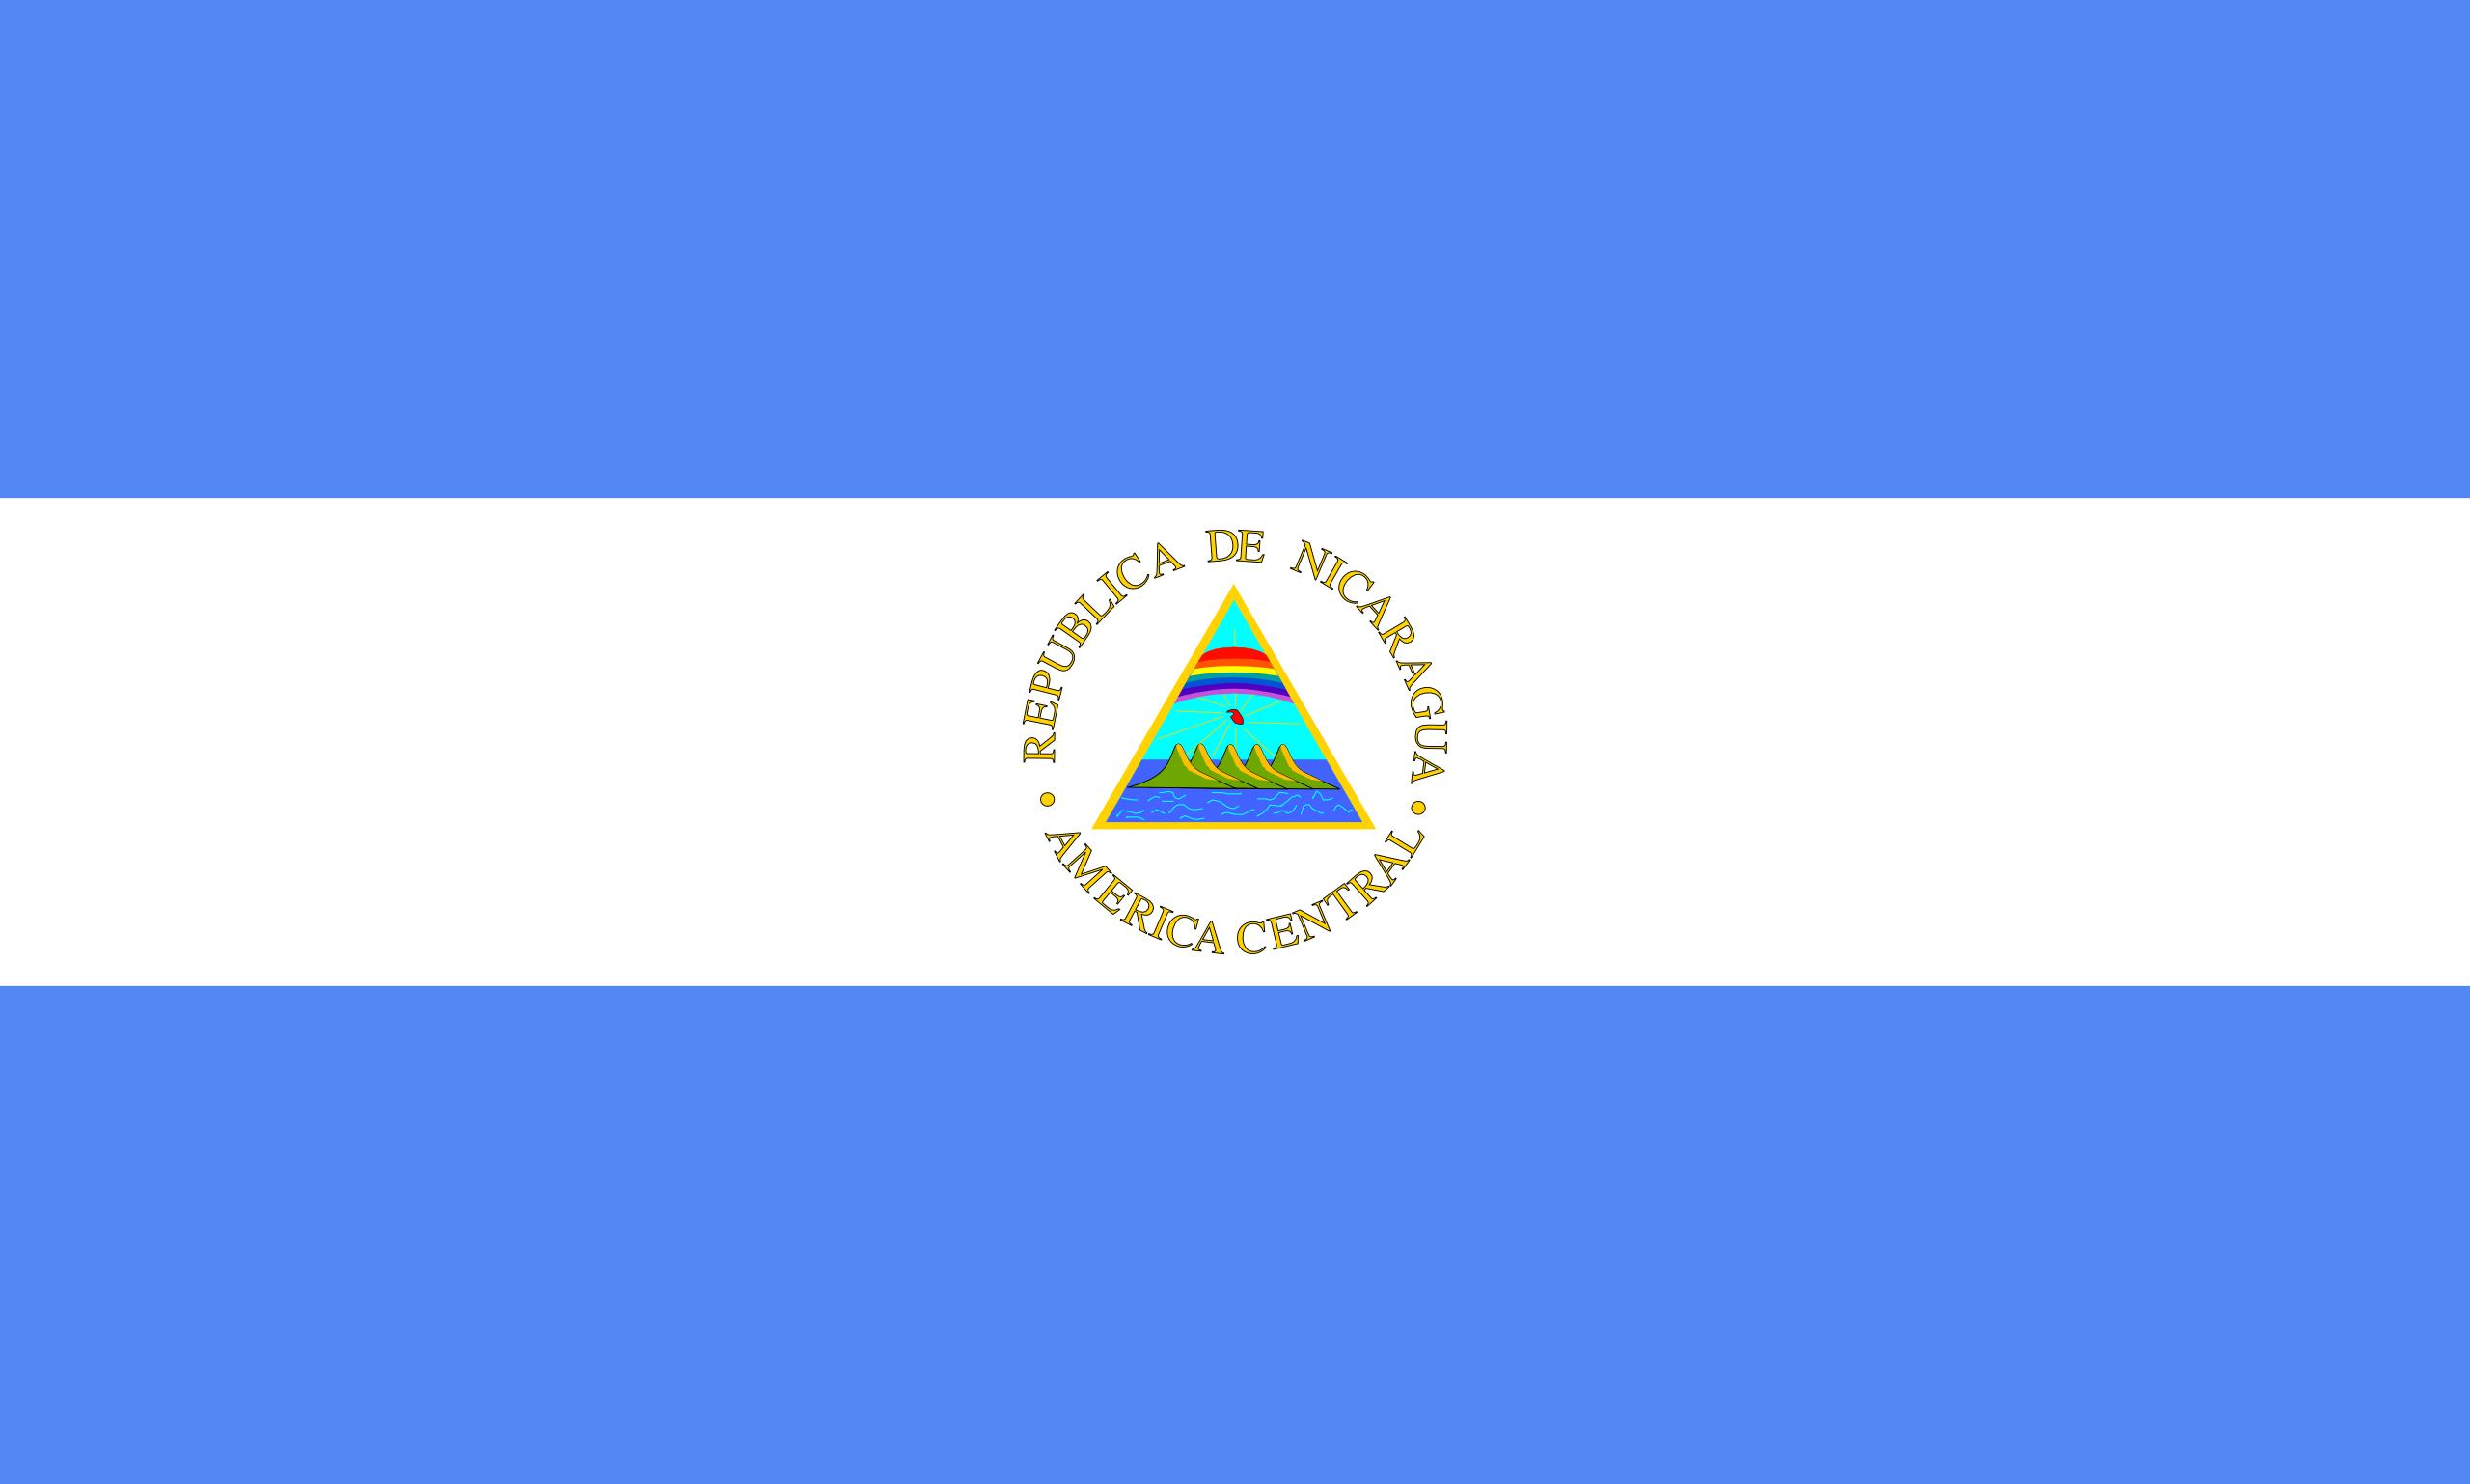 Никарагуа, страна, Эмблема, логотип, символ - Обои HD - Профессор falken.com